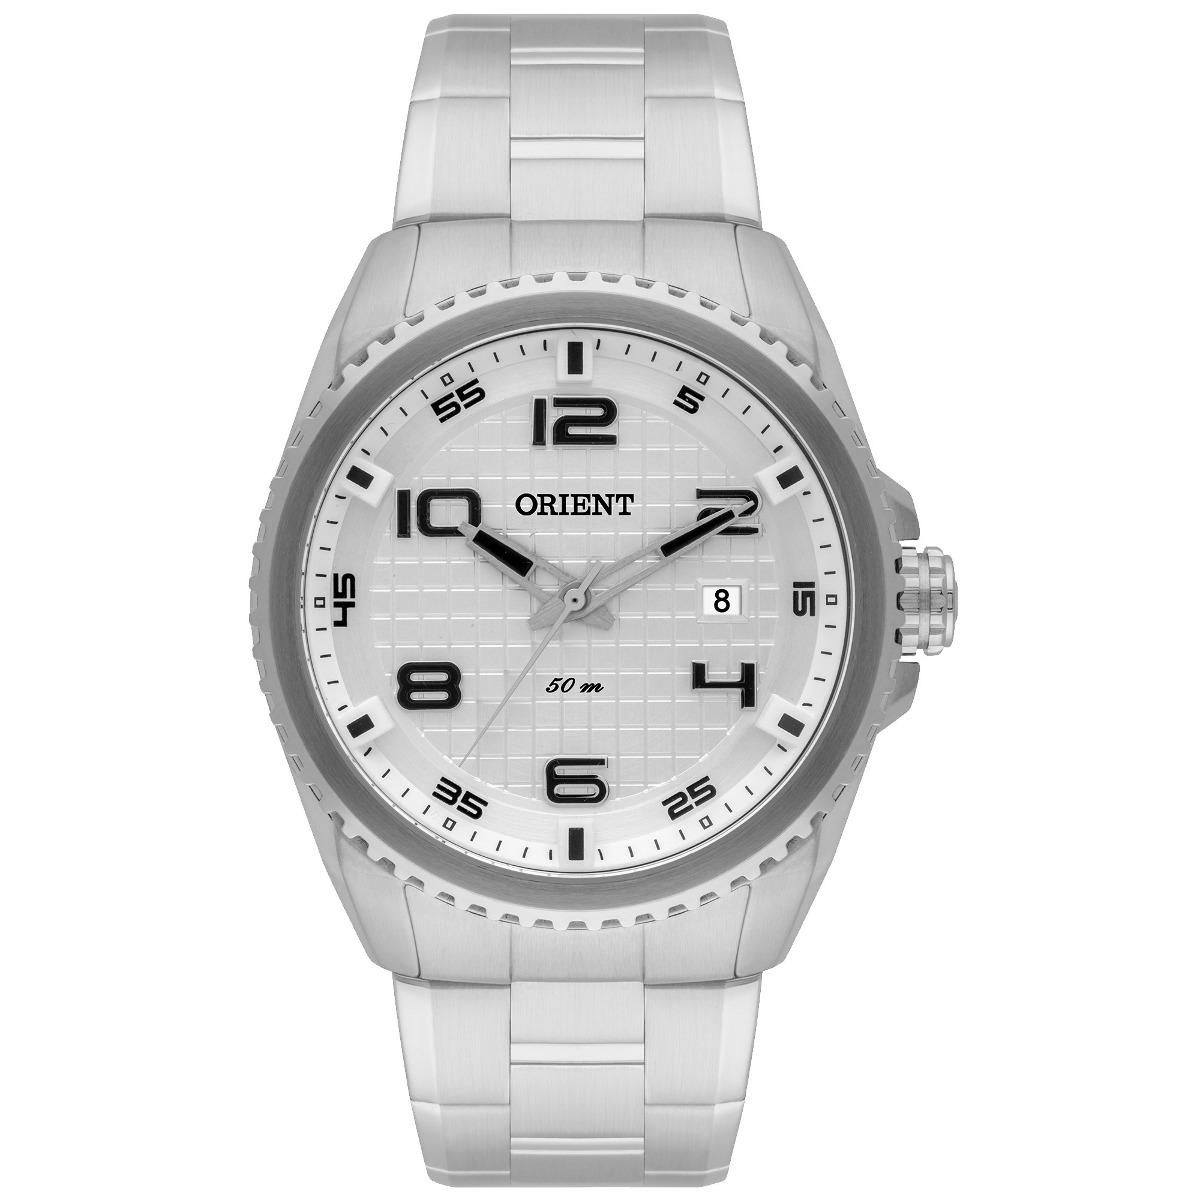 5b93449cde0 relógio orient masculino analógico esportivo mbss1260 s2sx. Carregando zoom.